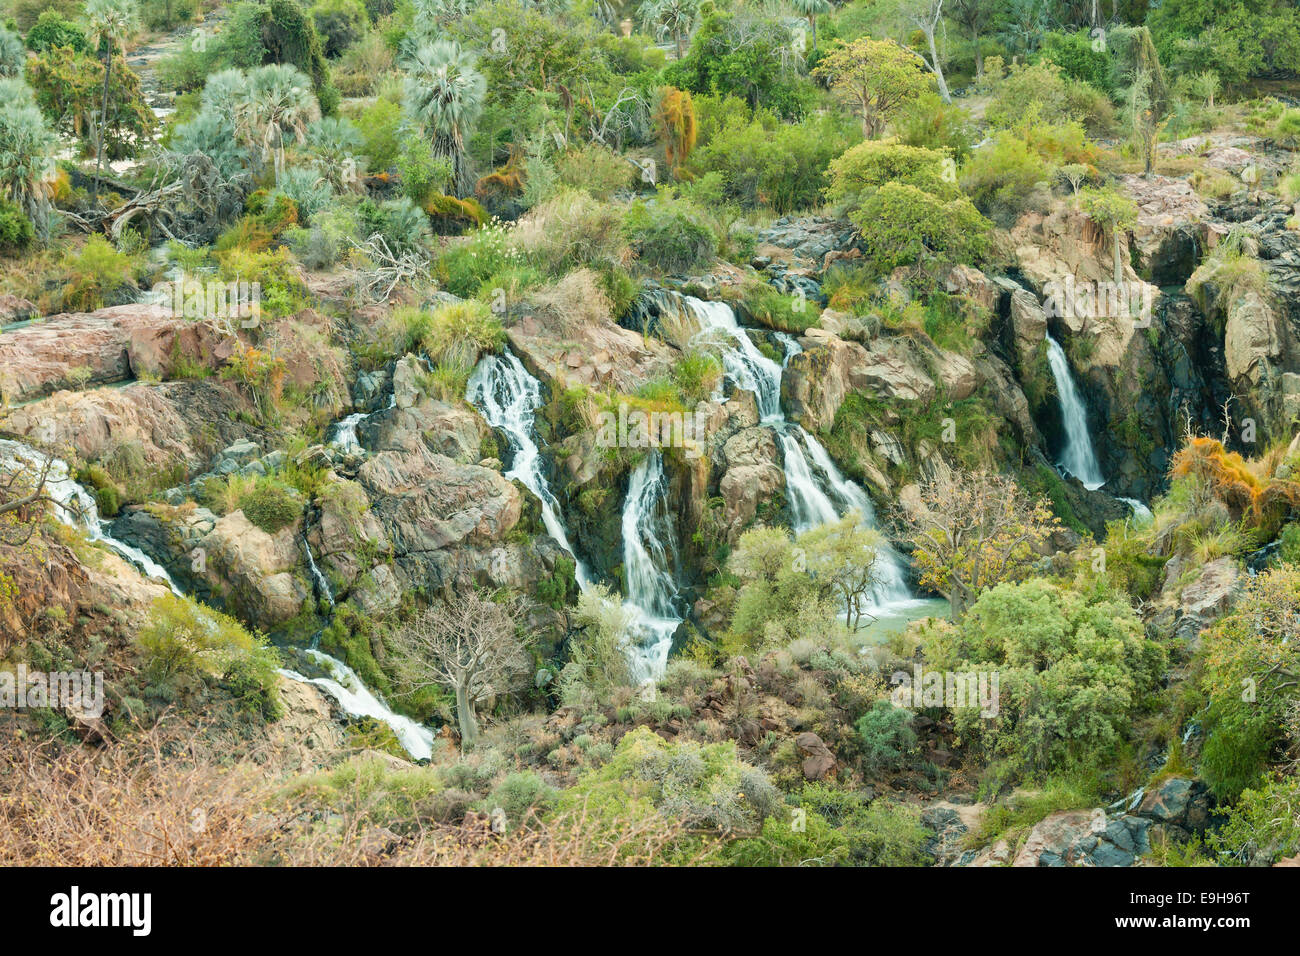 Epupa Falls, Kunene river on the border between Namibia and Angola, Kunene Region, Namibia Stock Photo